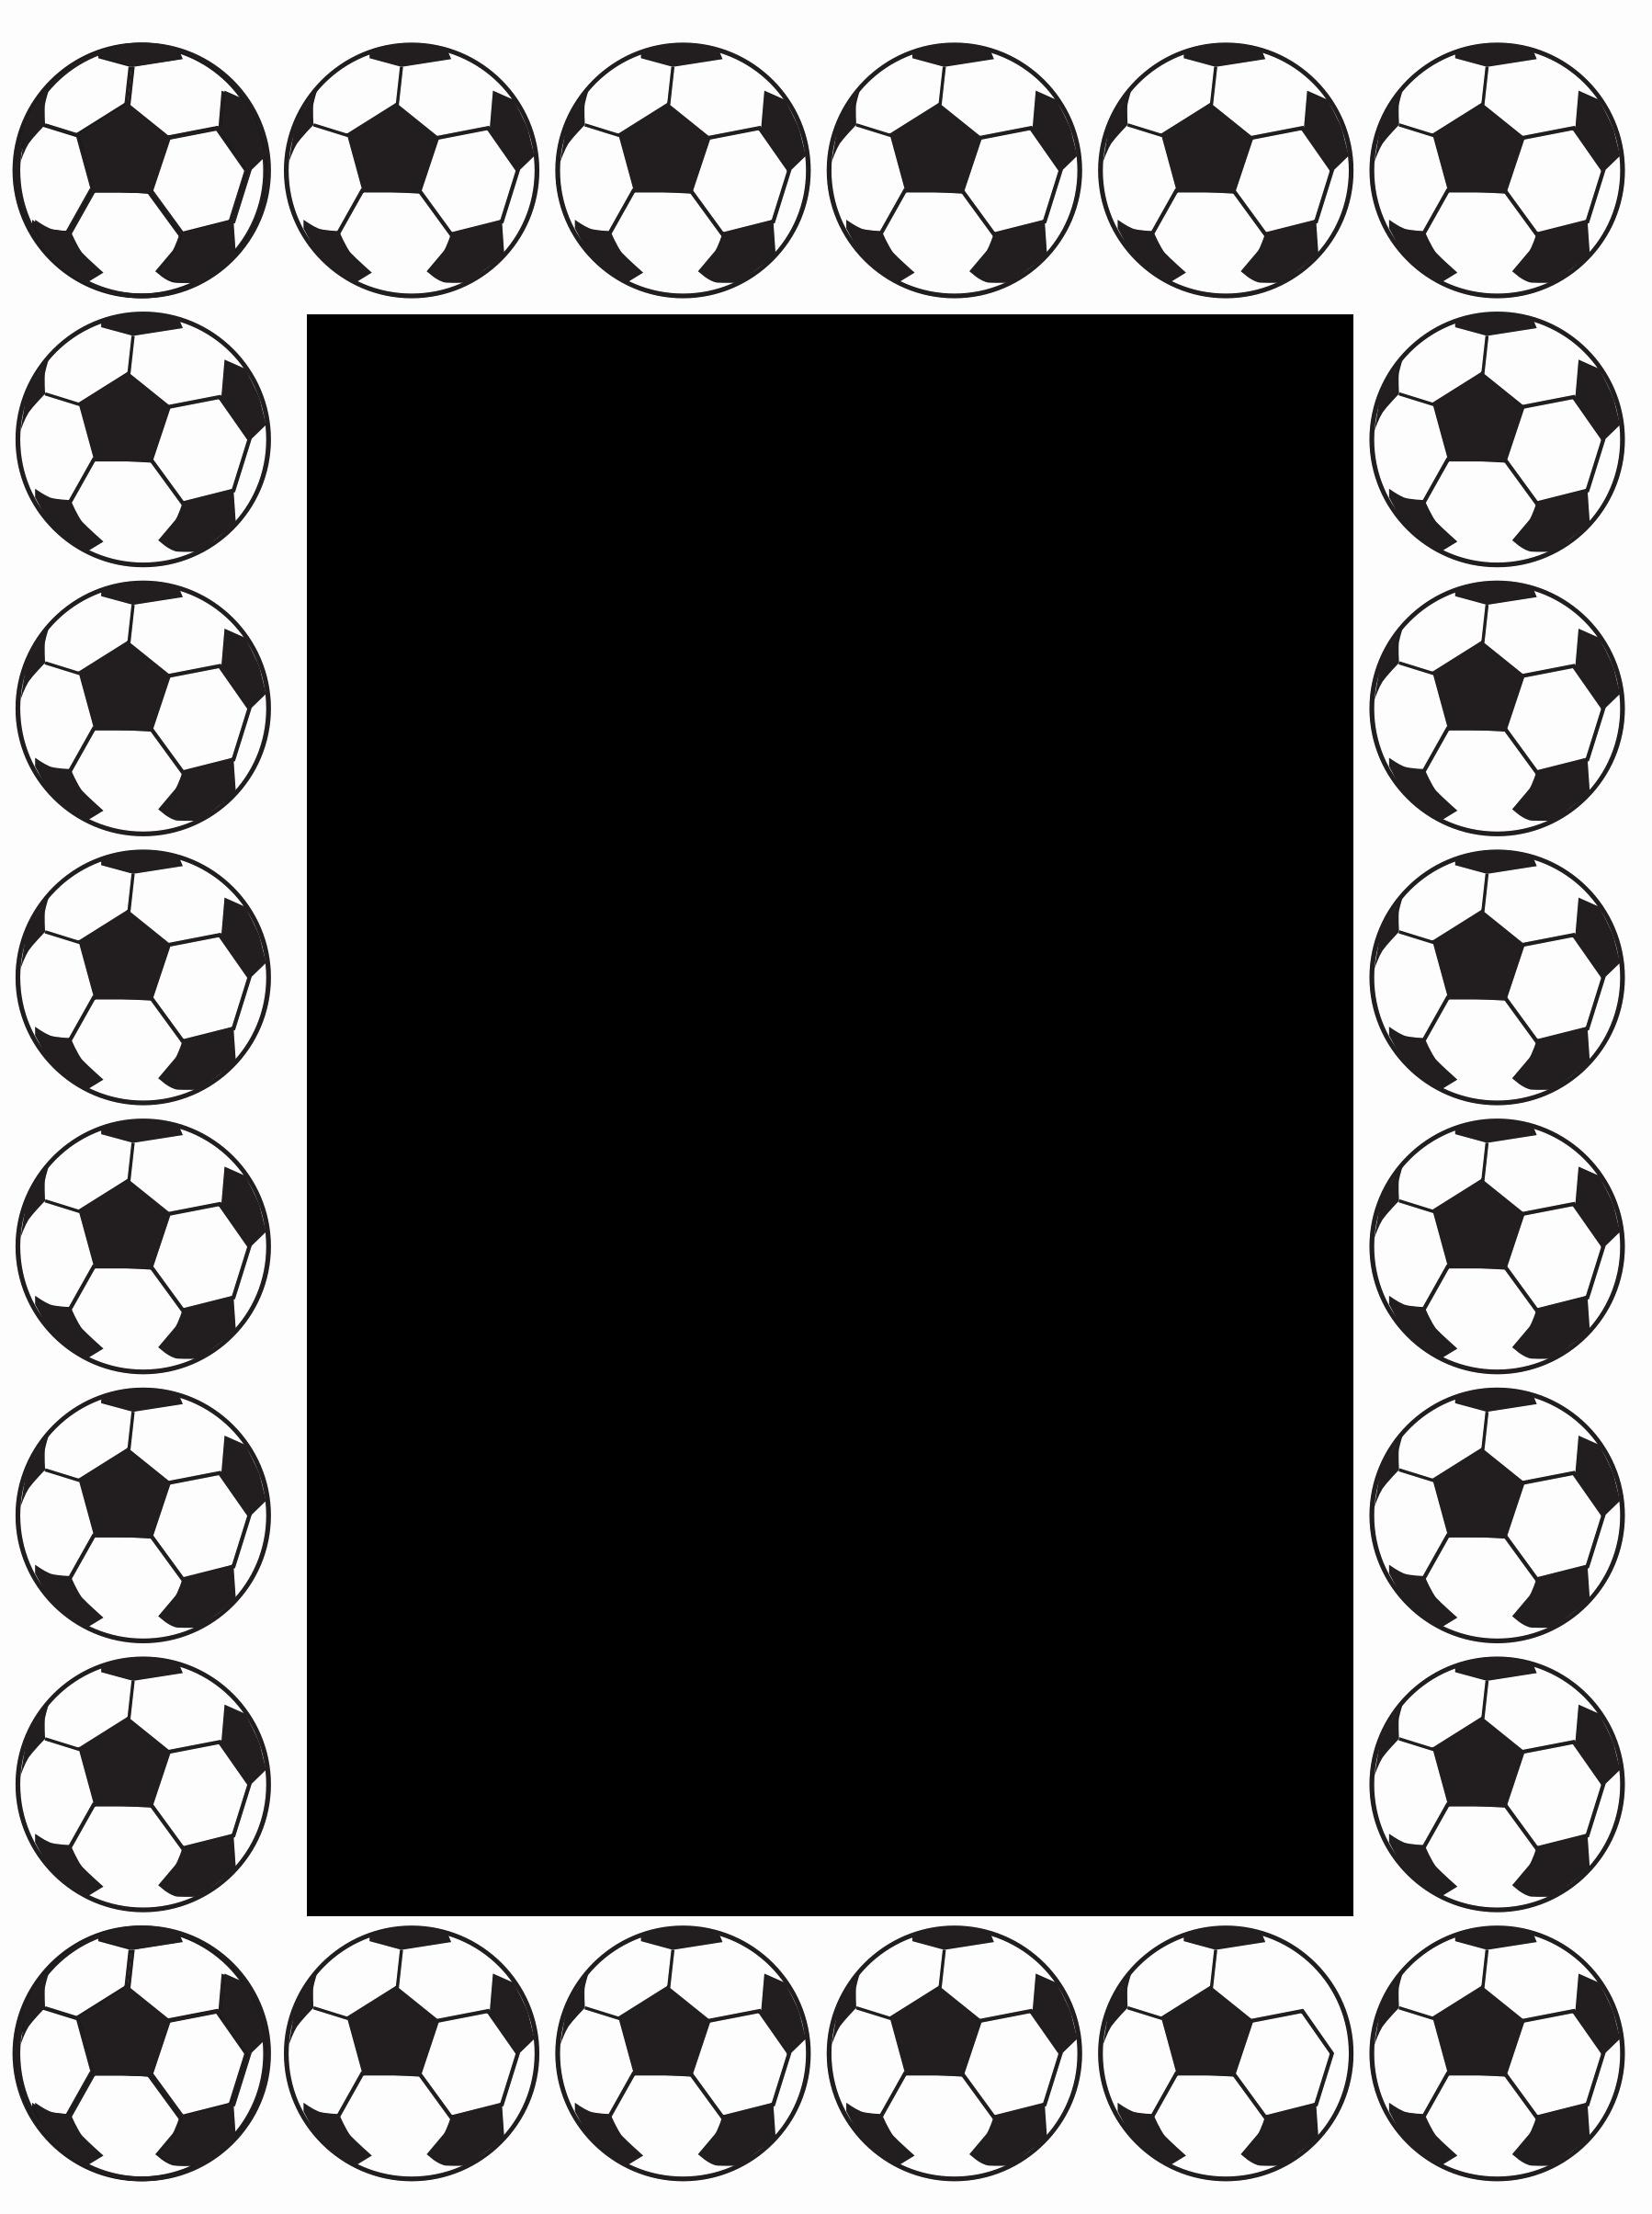 Football Border for Word Unique Free Football Frame Border